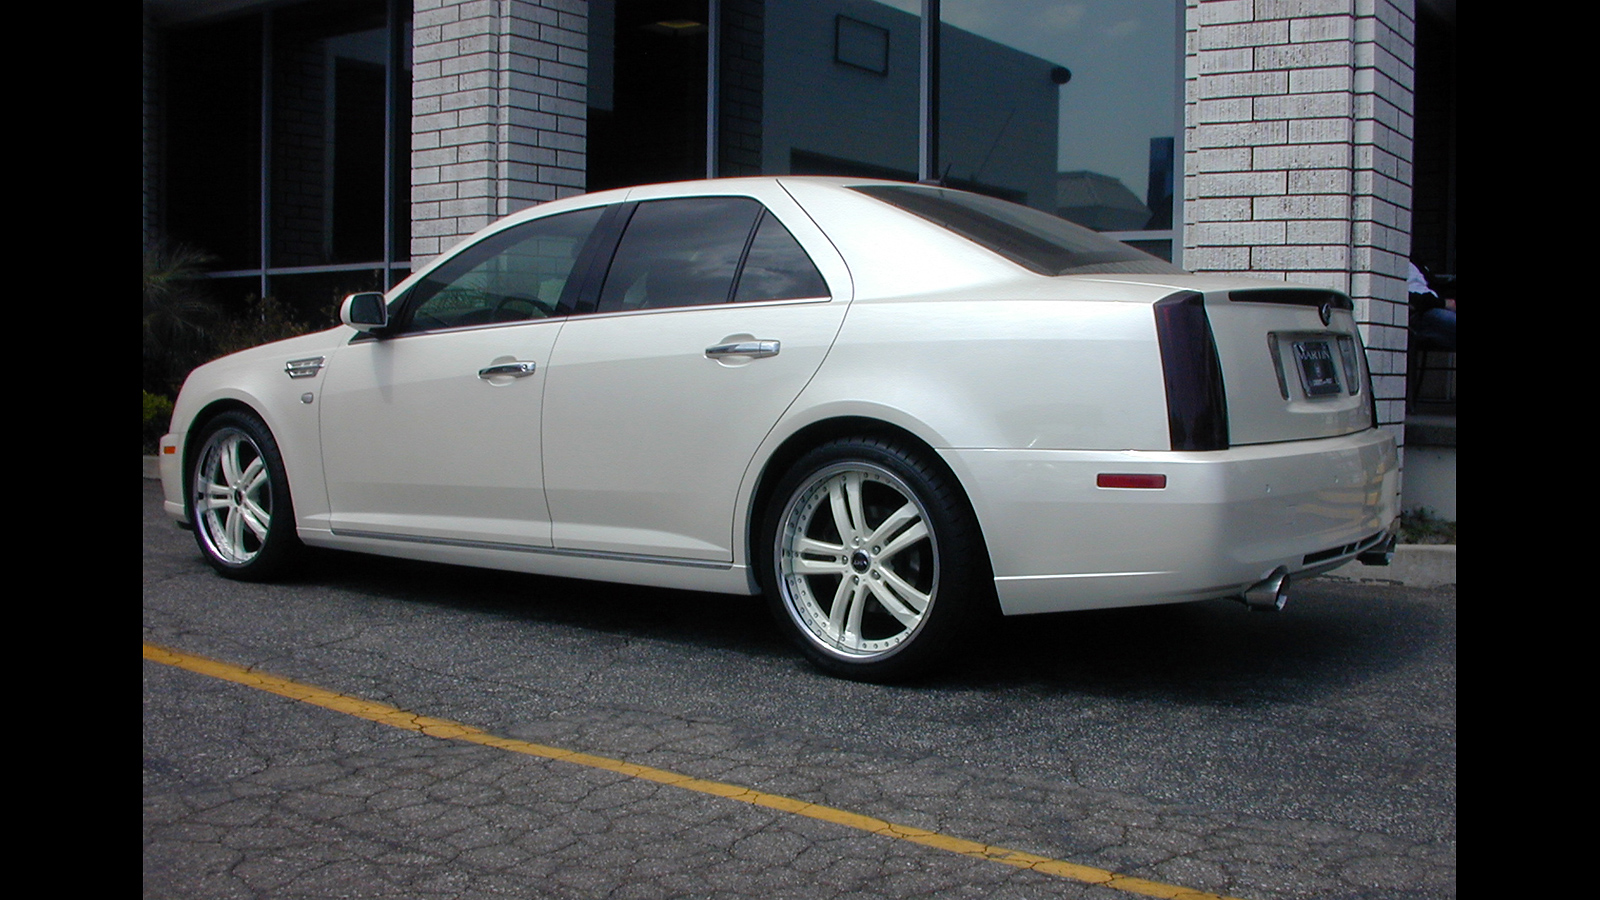 2006 Sts V 20 Inch Wheels